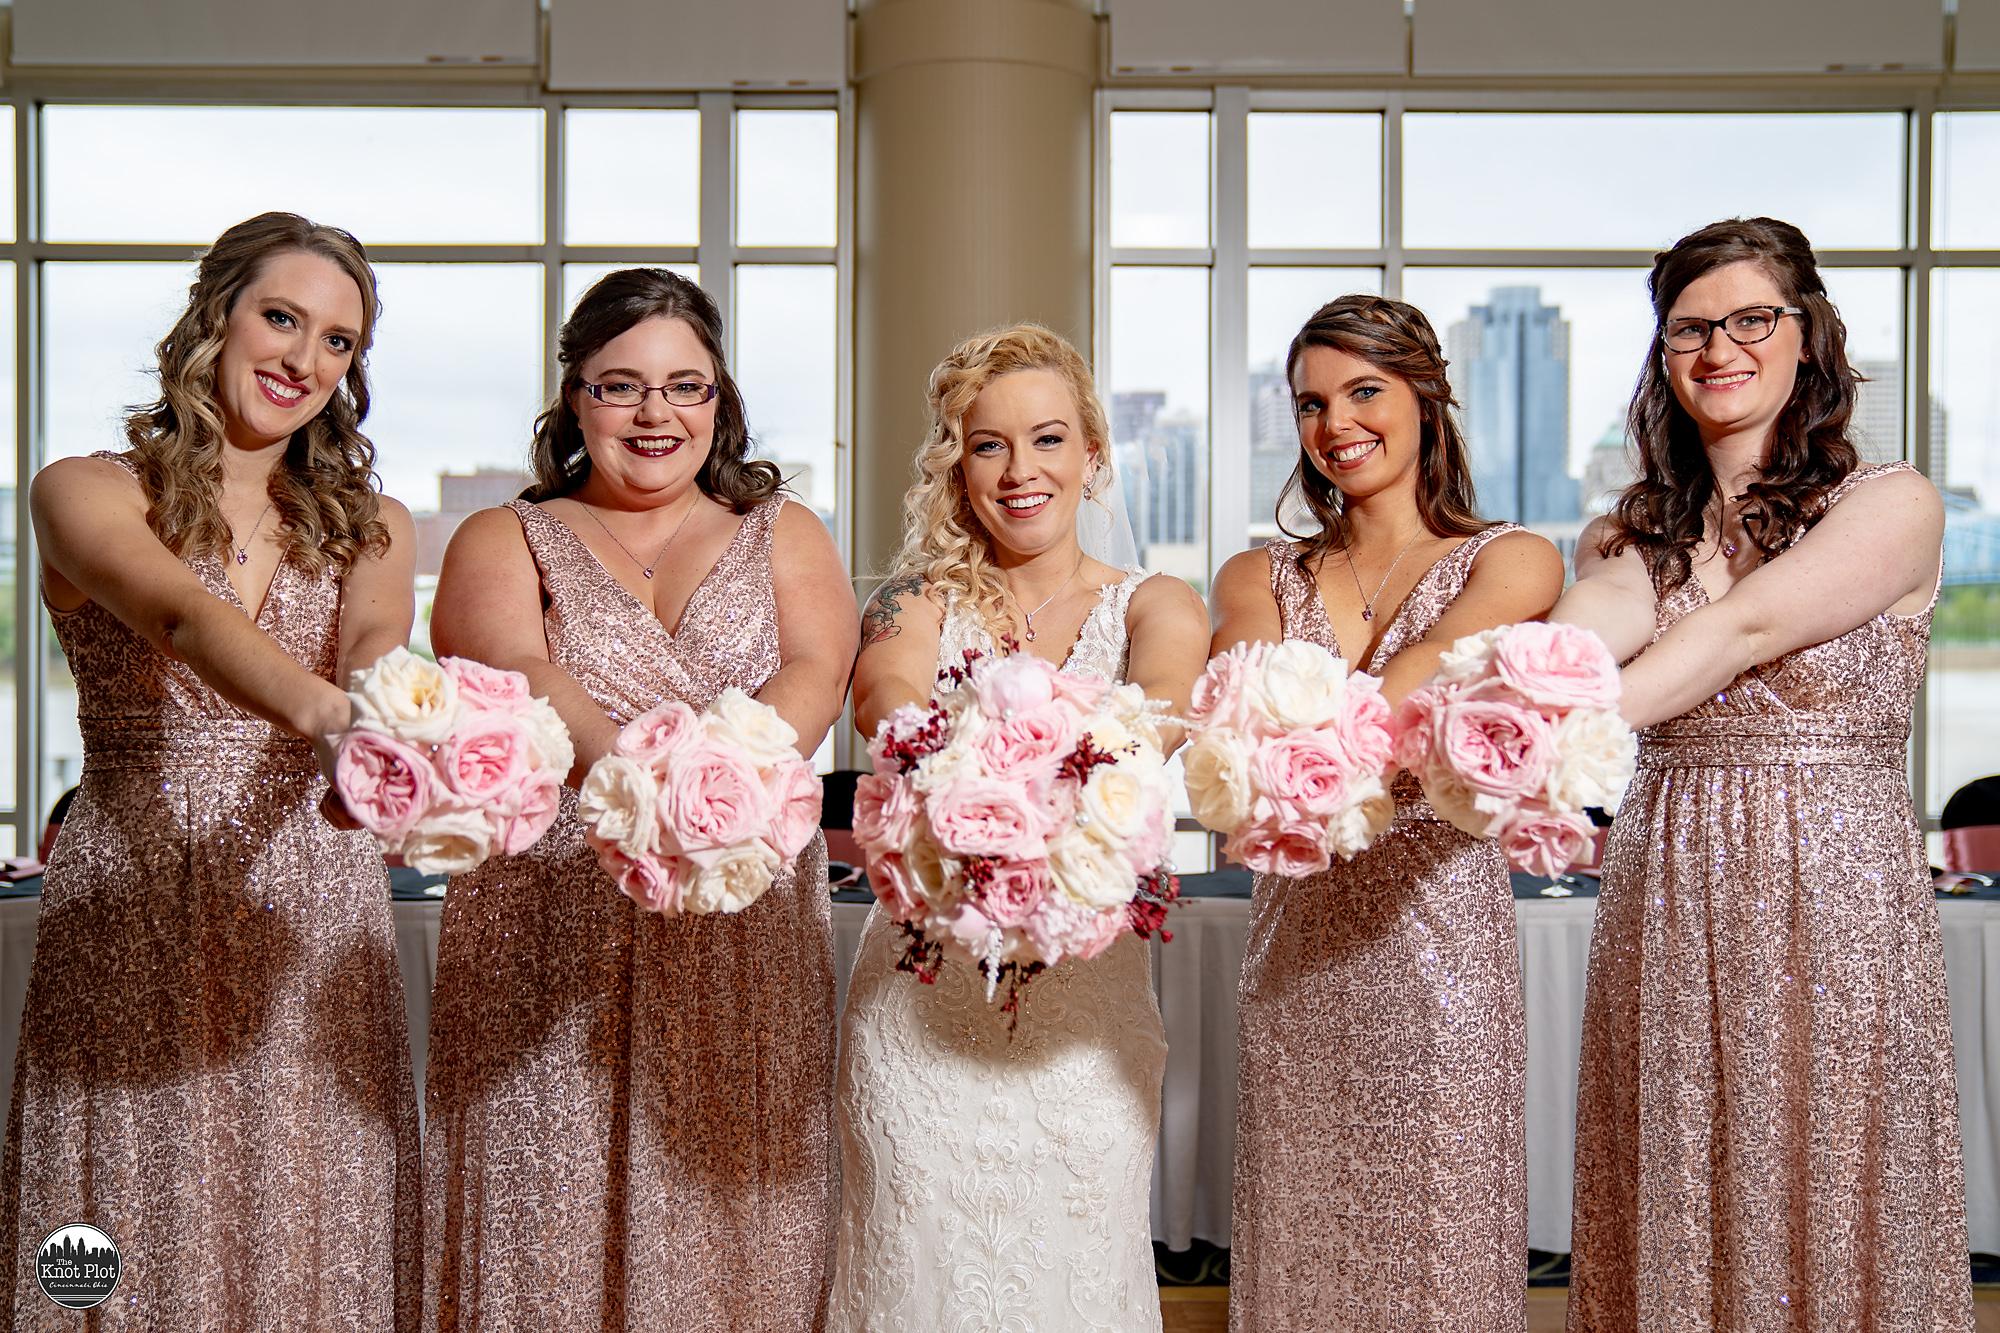 Embassy-Suites-Rivercenter-Cincinnati-Wedding-Photography-9.jpg